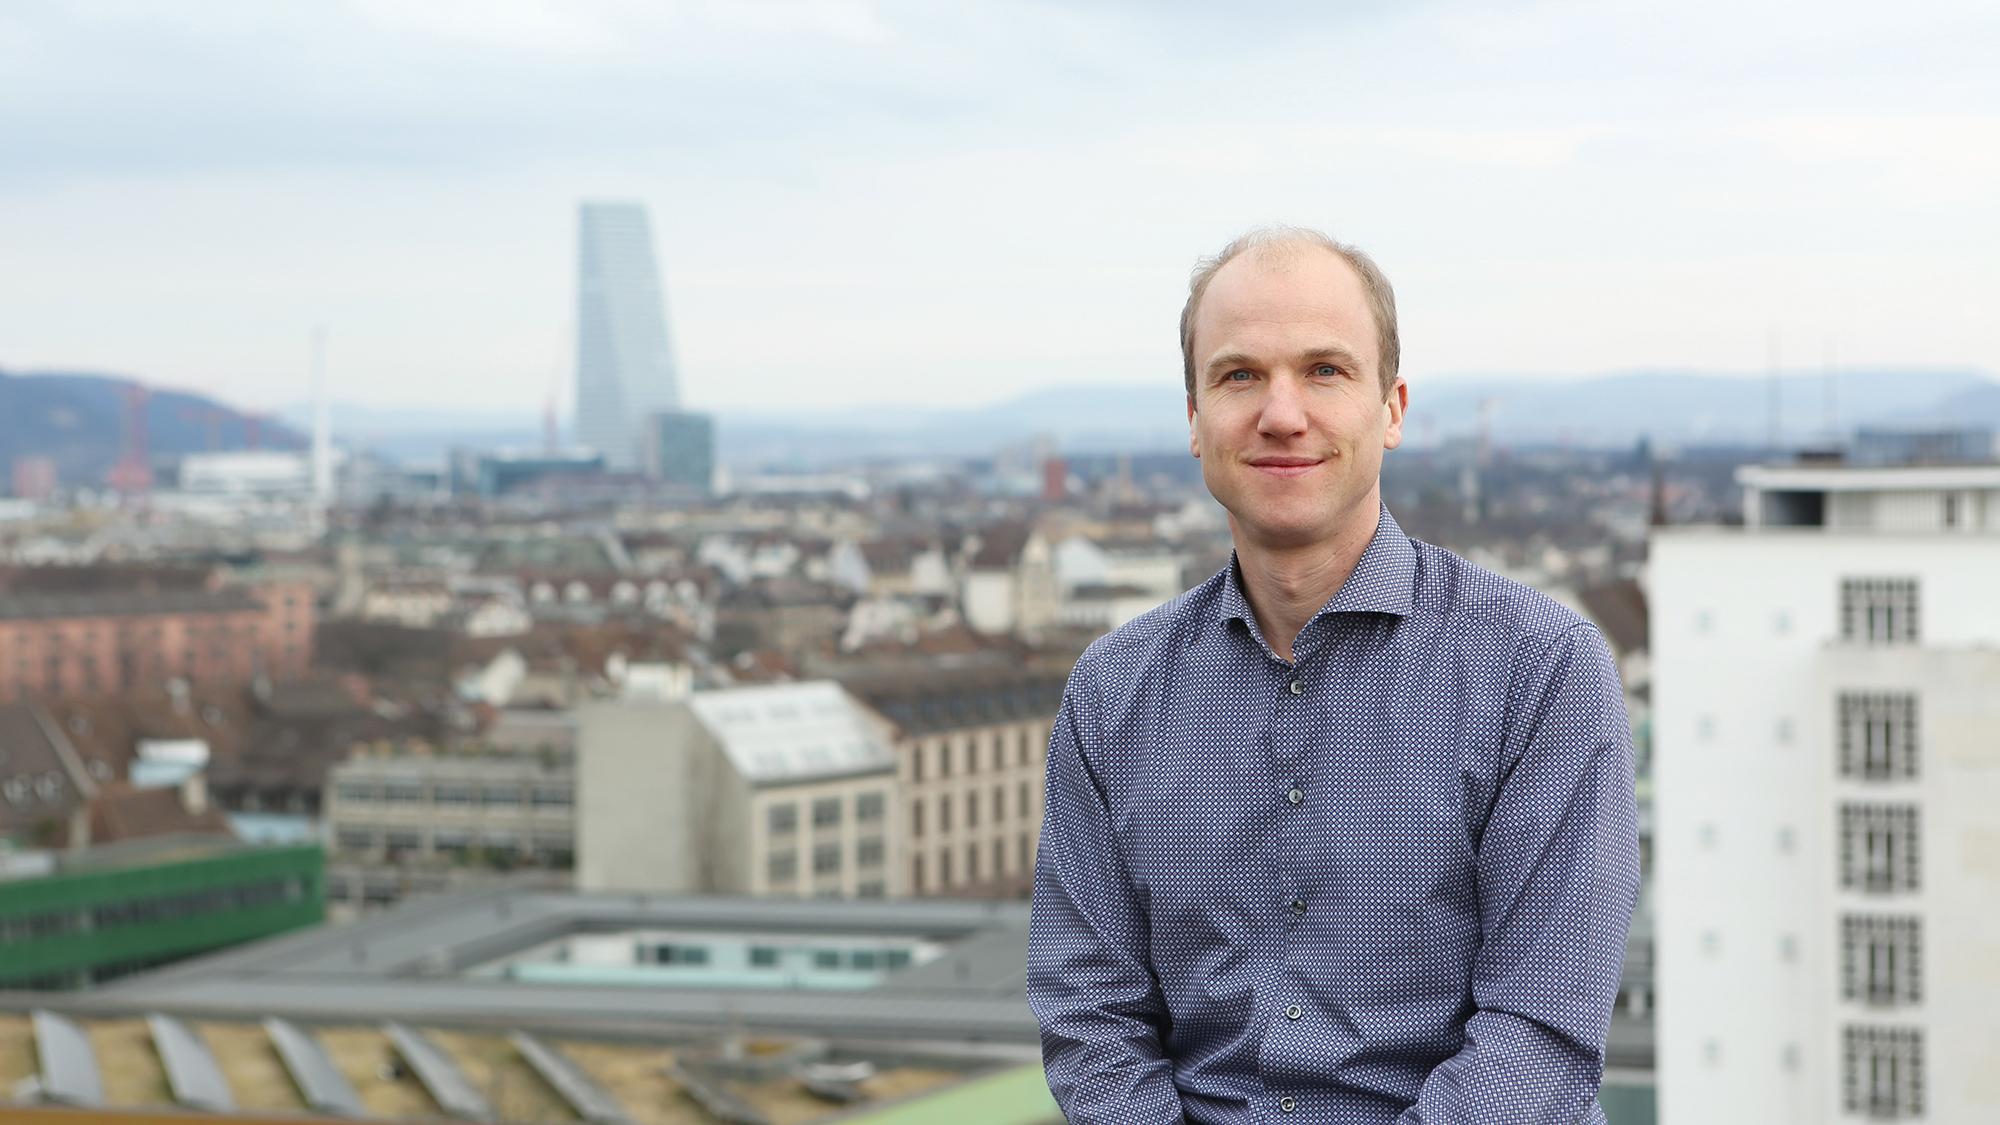 «Virenstämme zeigen anschaulich, wie rasch Evolution geschehen kann», sagt Richard Neher.